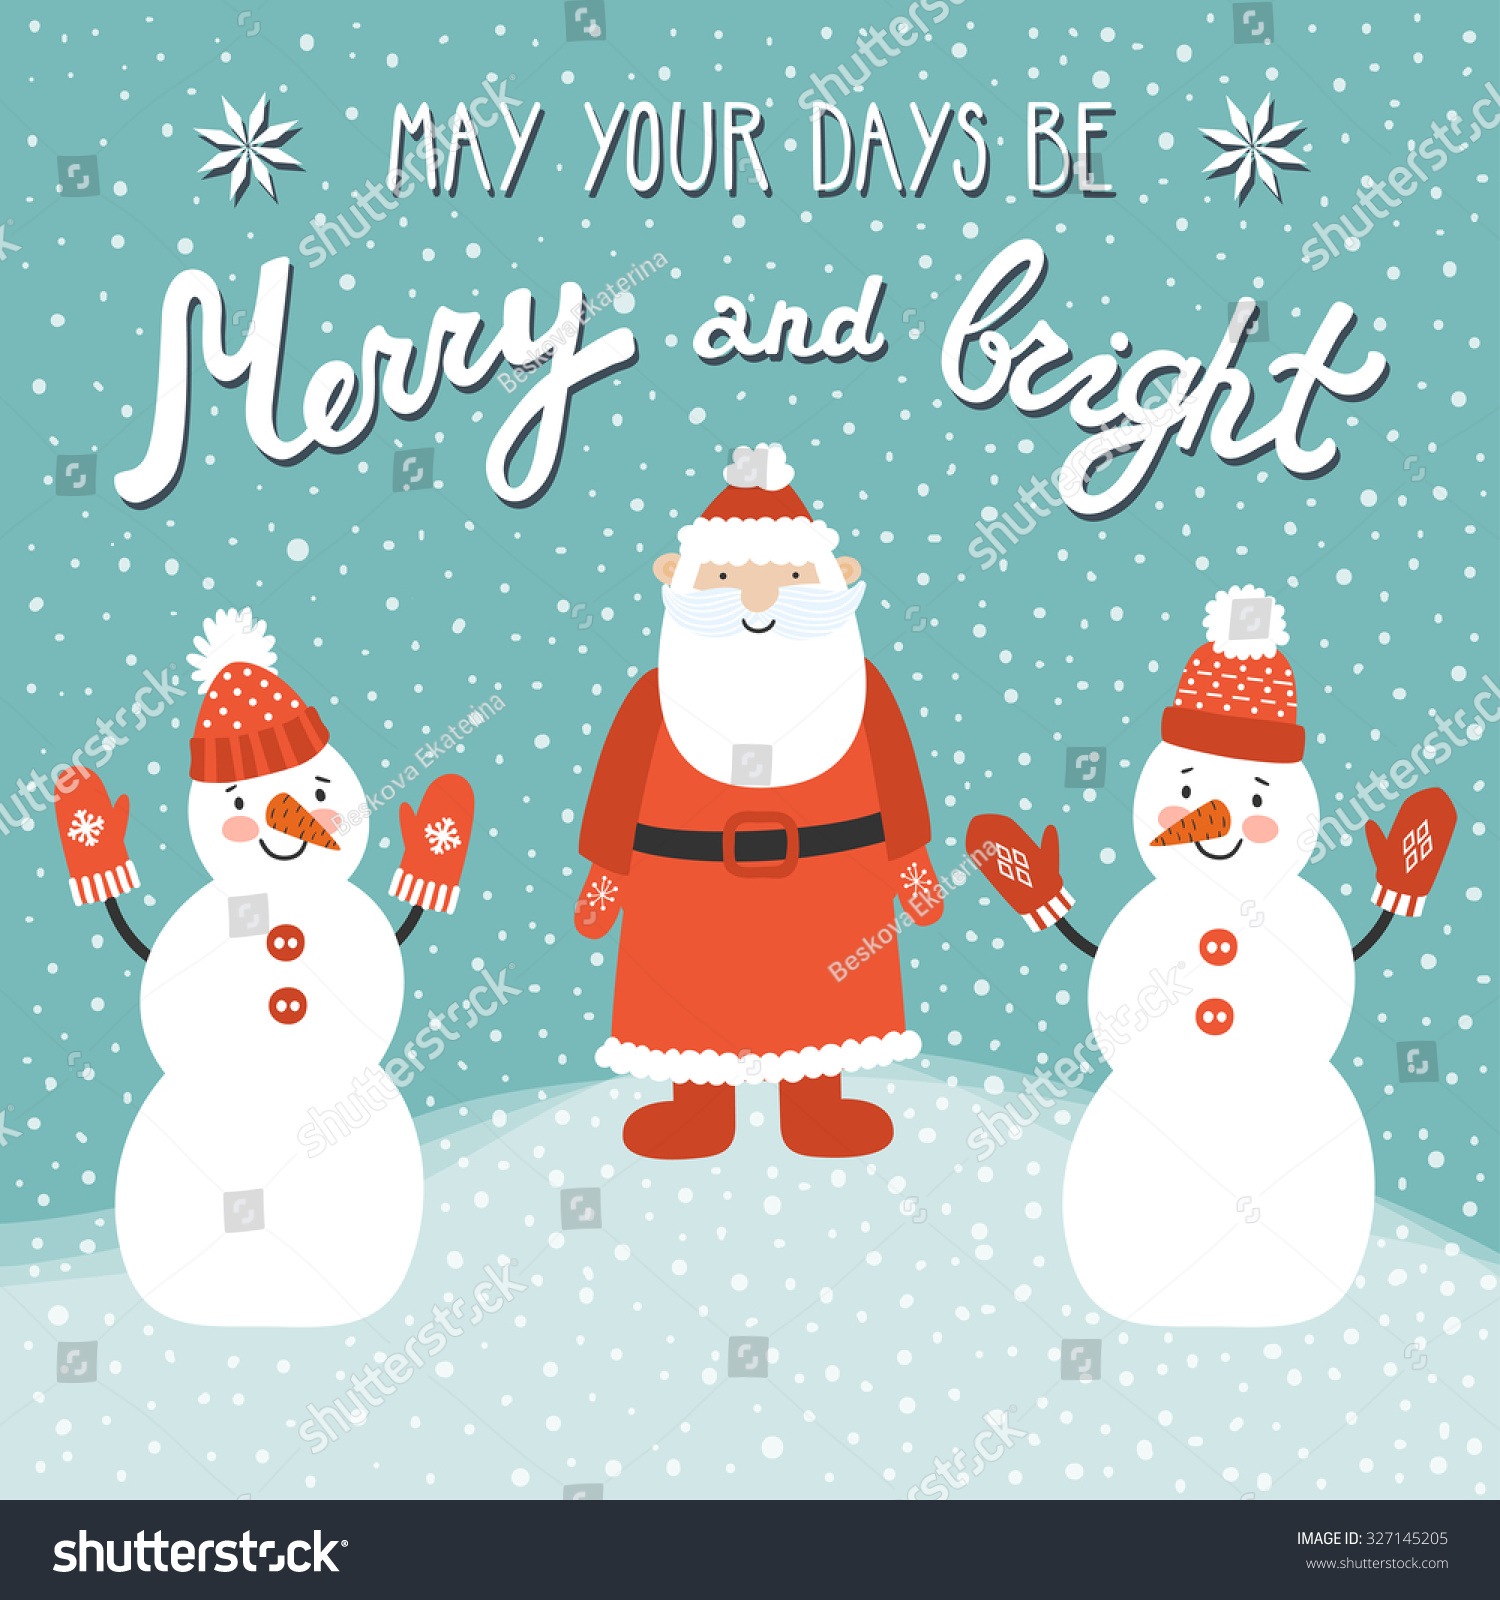 Christmas Card Santa Claus Two Snowmen Stock Vector (Royalty Free ...